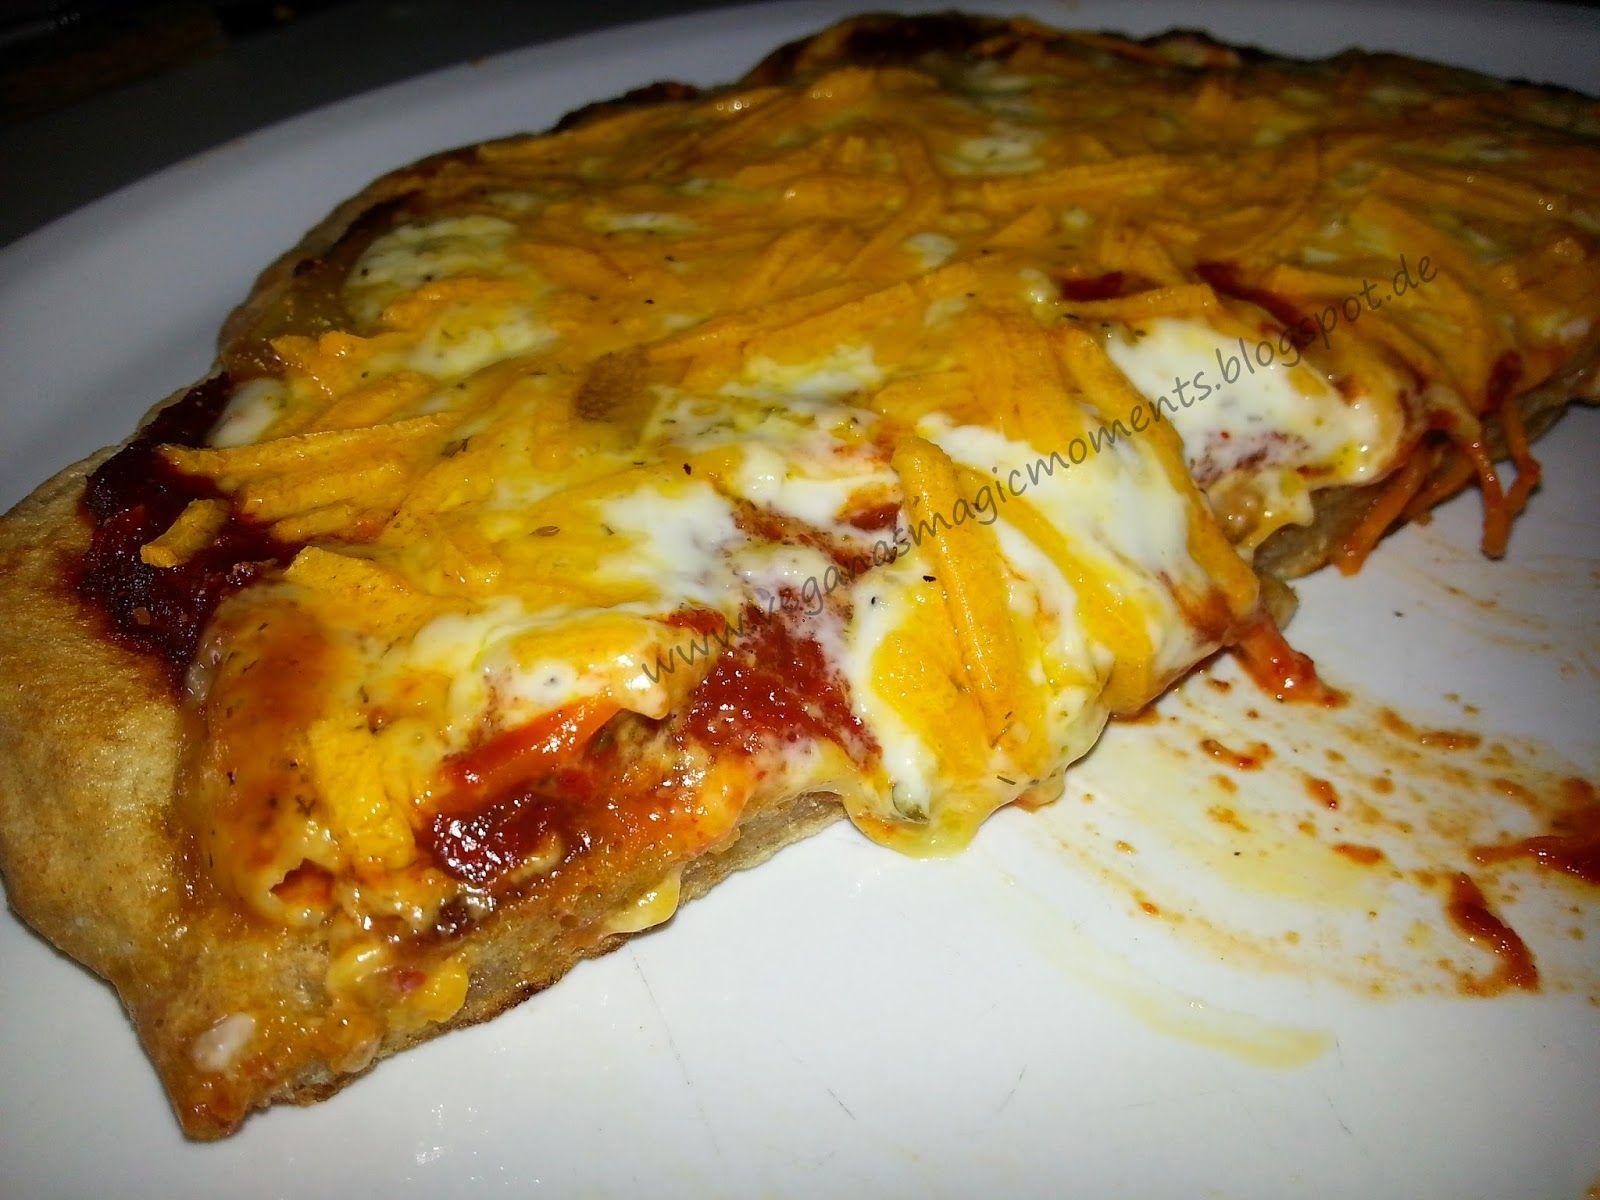 VEGANAS MAGIC MOMENTS: Pfannenpizza vegan: Lachs-(Nachbau)-Spinat und quattro formaggi